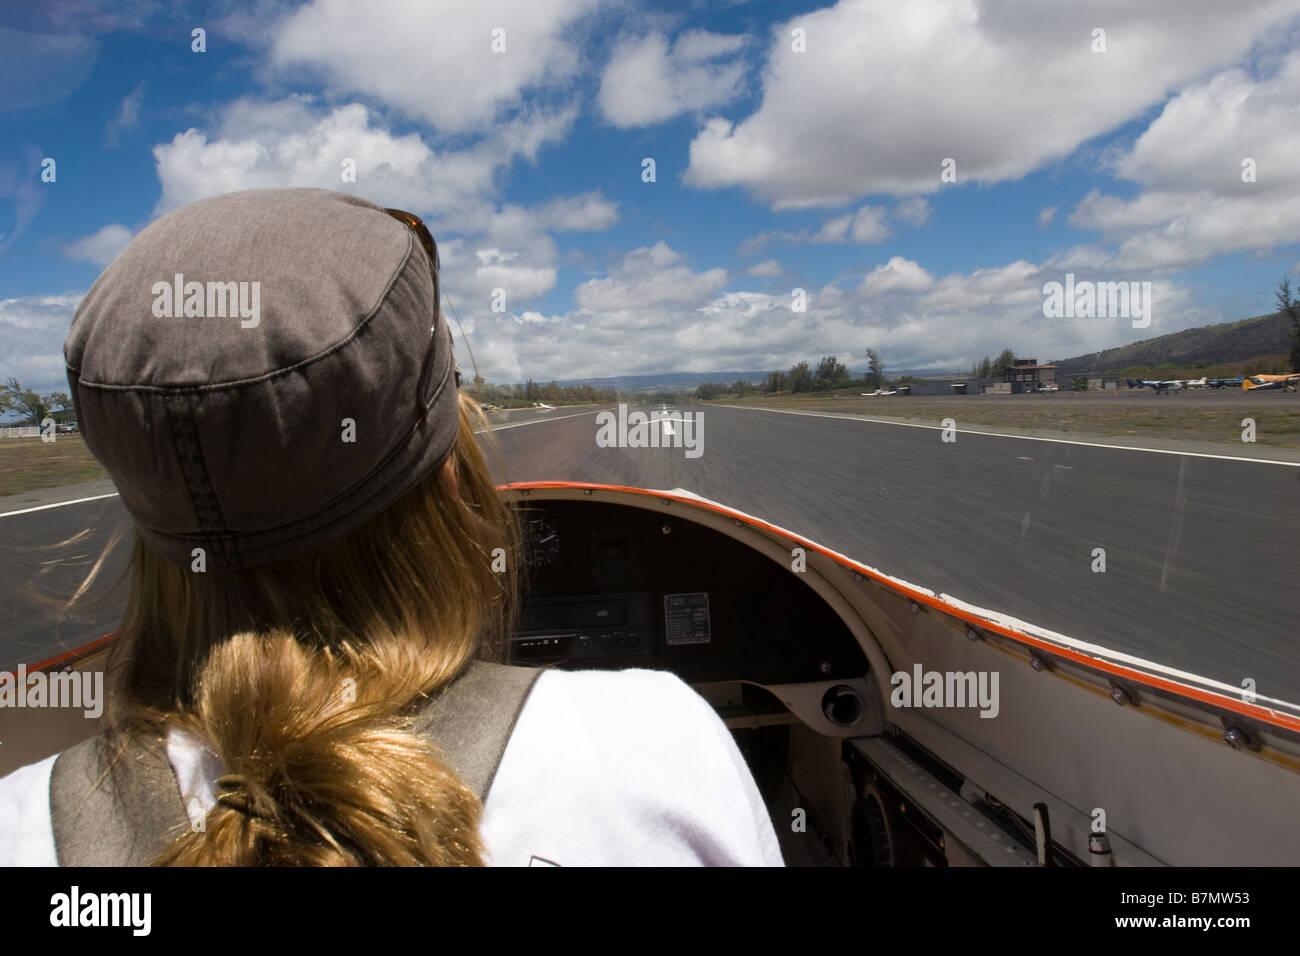 Female pilot landing glider airplane on runway at Dillingham Airfield in Oahu Hawaii - Stock Image